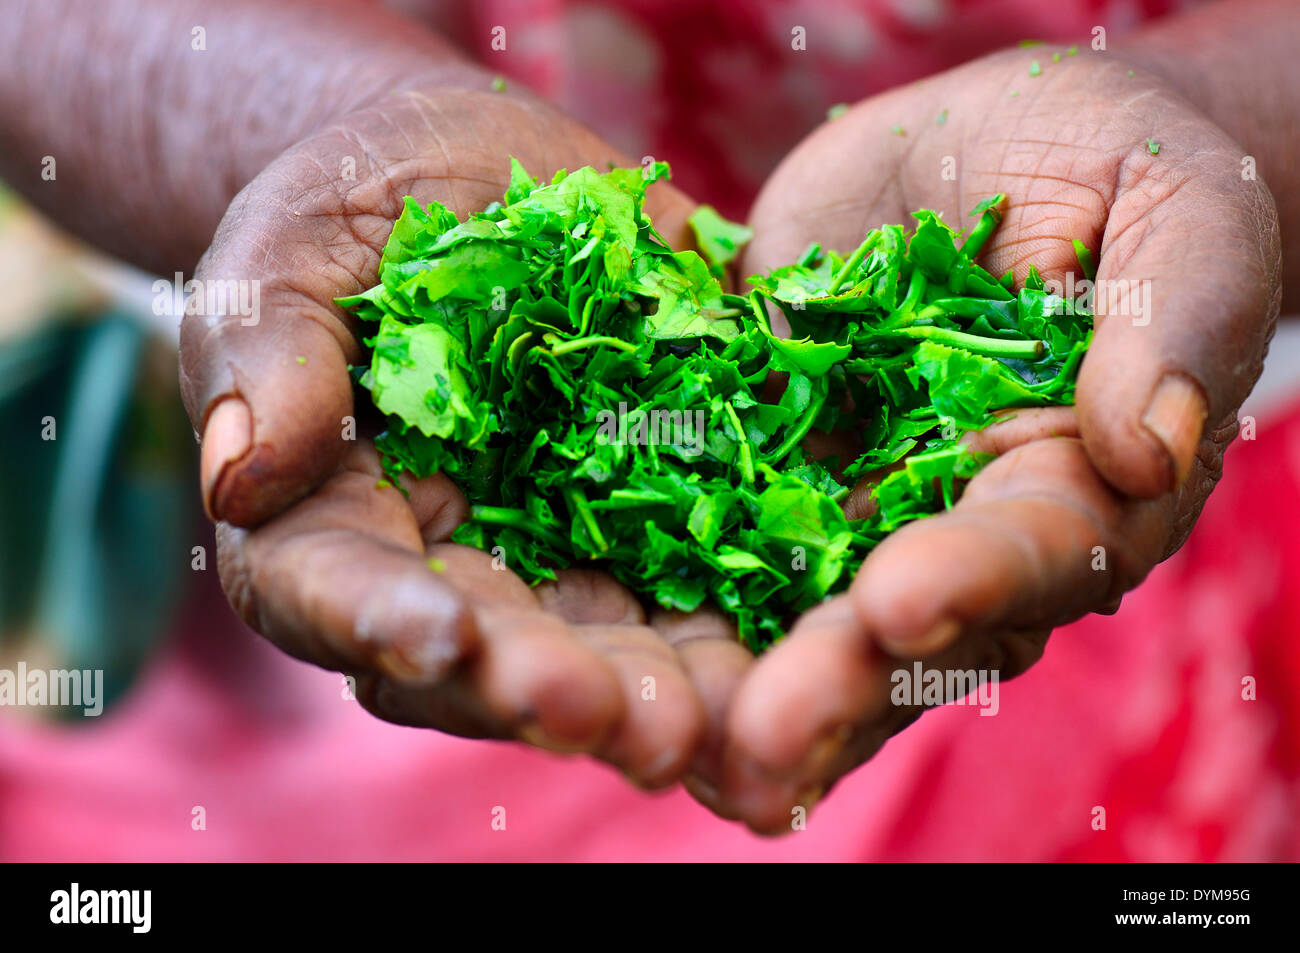 Ältere Frau, die Teeblätter in ihren Händen, Ella, Uva, Sri Lanka hält Stockfoto